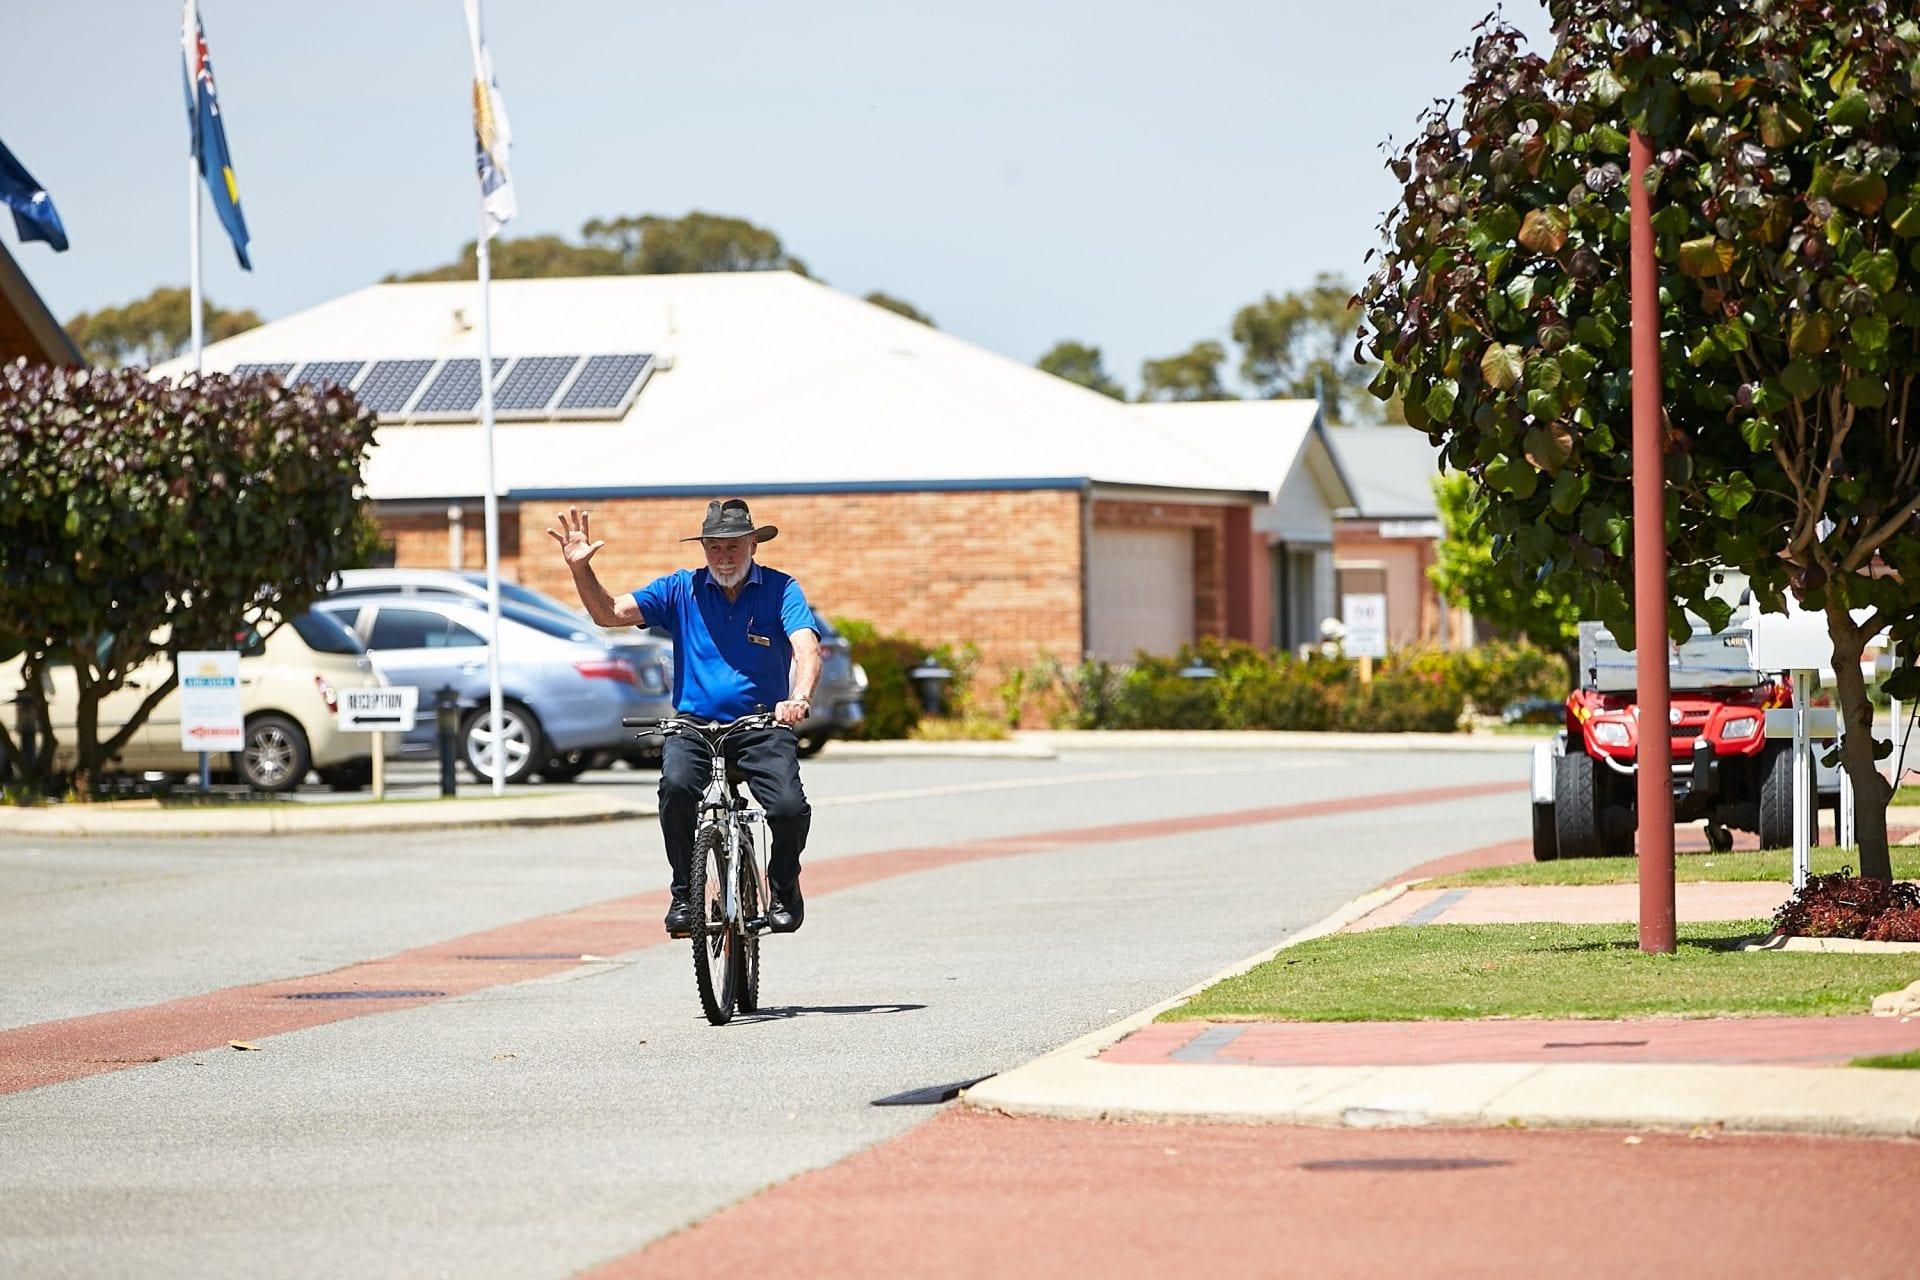 Mandurah resident on bike